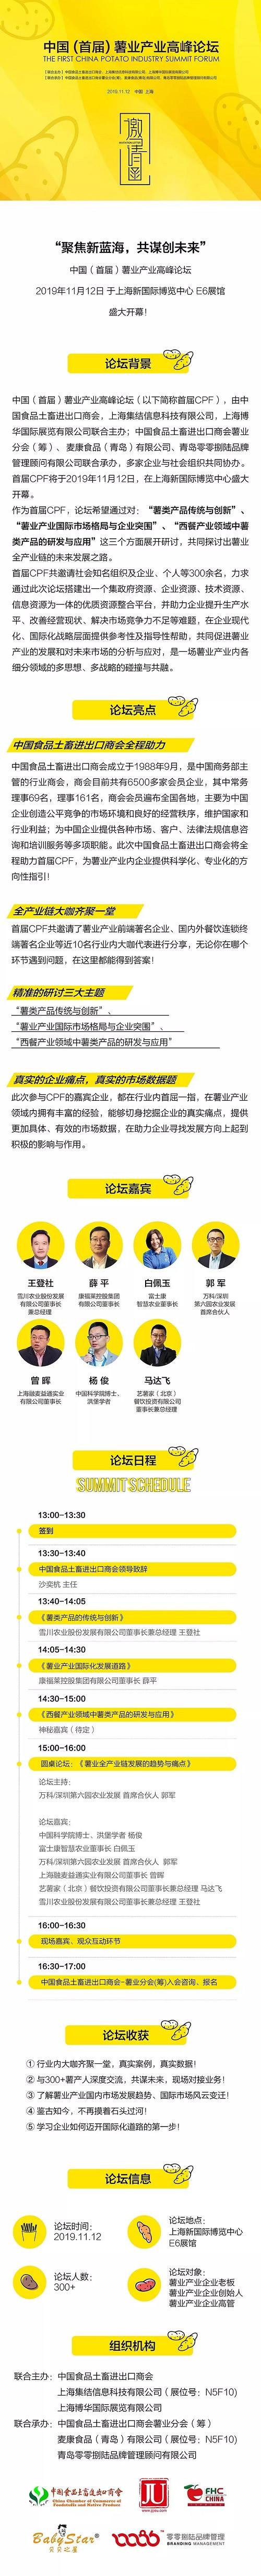 FHC,薯业产业,薯业论坛,中国(首届)薯业产业高峰论坛重磅来袭!